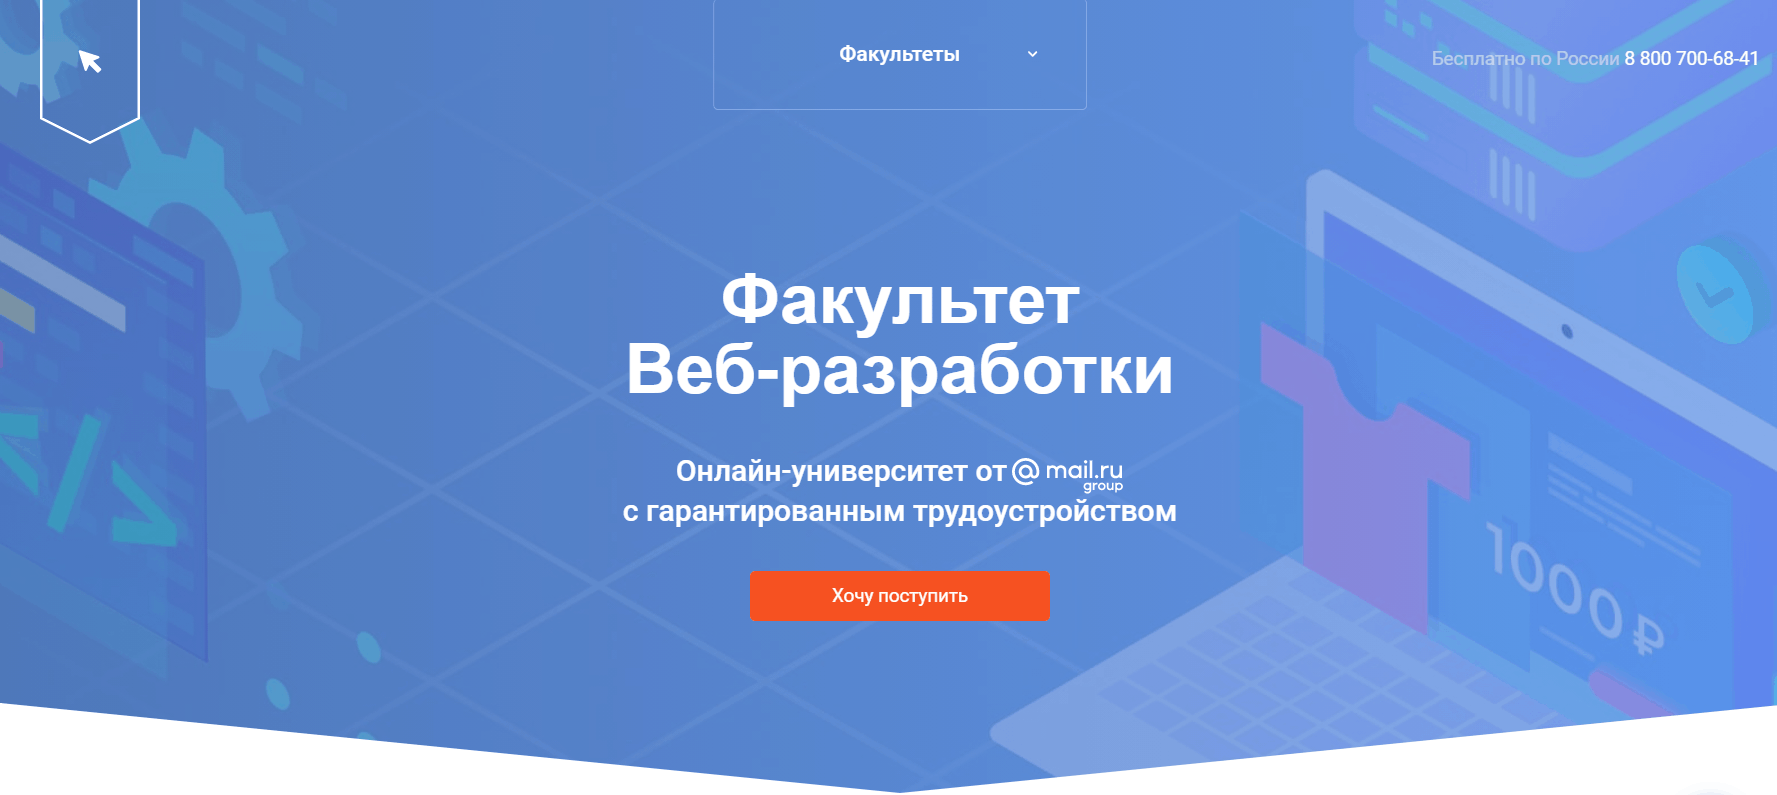 Факультет Веб-разработки GeekBrains